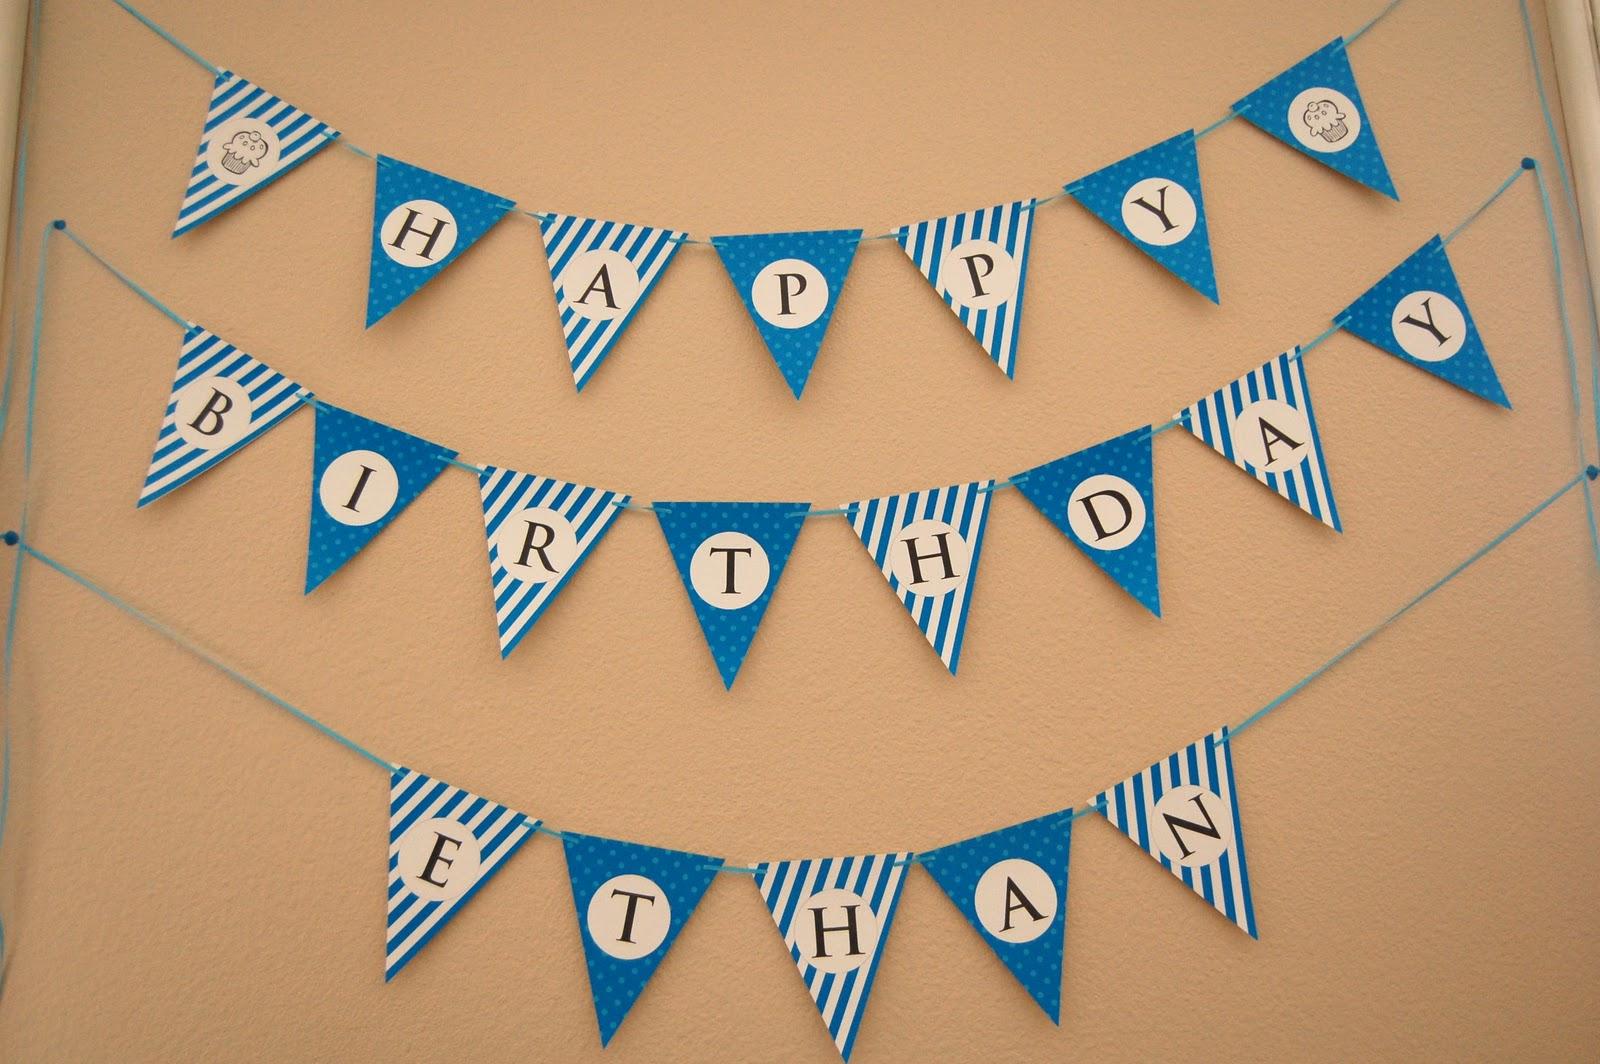 13 Happy Birthday Banner Design Images - Free Happy Birthday Banner - Free Printable Happy Birthday Banner Templates